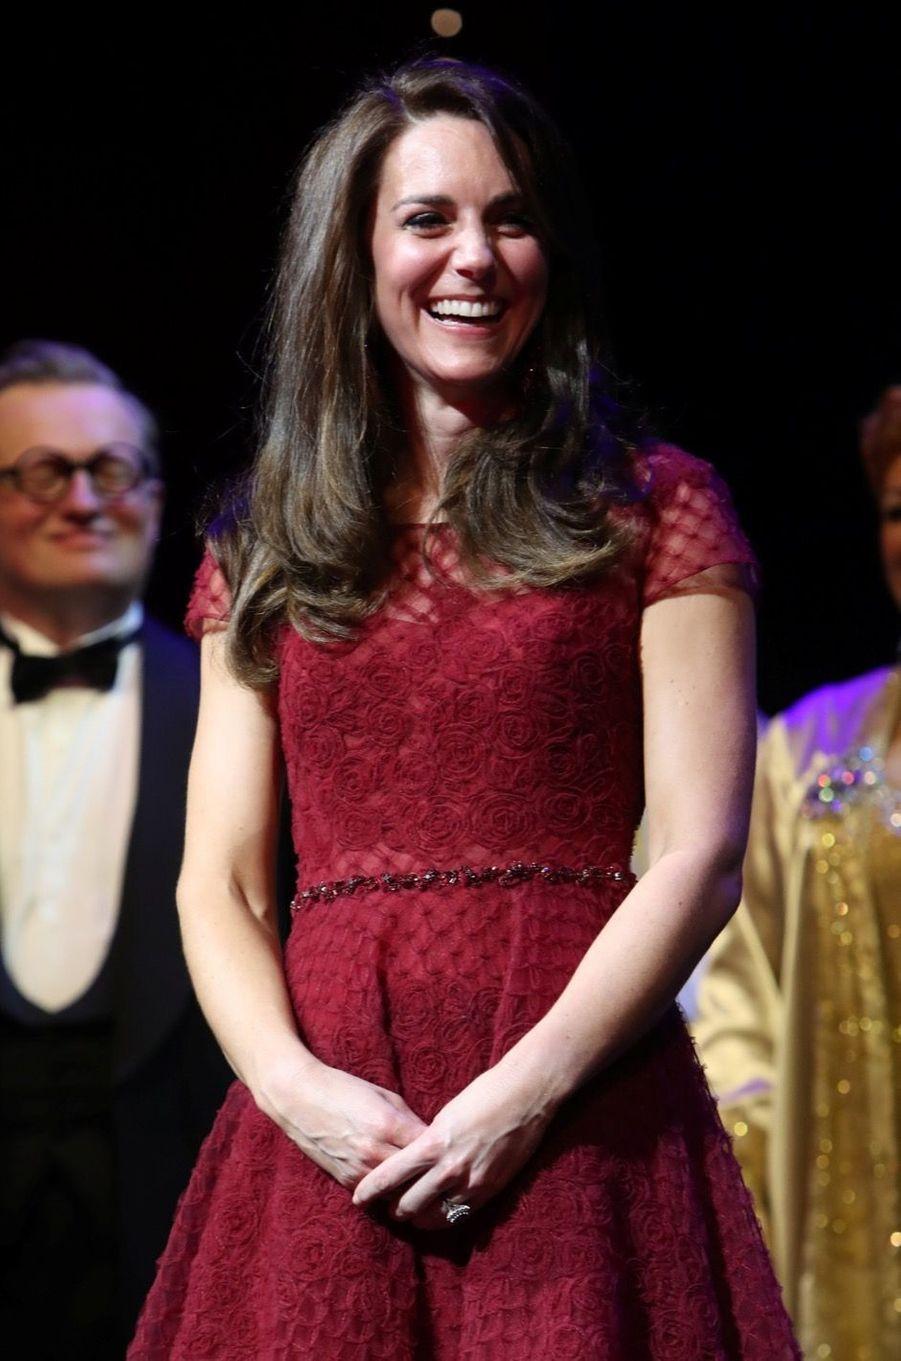 Kate Middleton Au Theatre Royal Drury Lane De Londres Mardi 4 Avril 2017 24